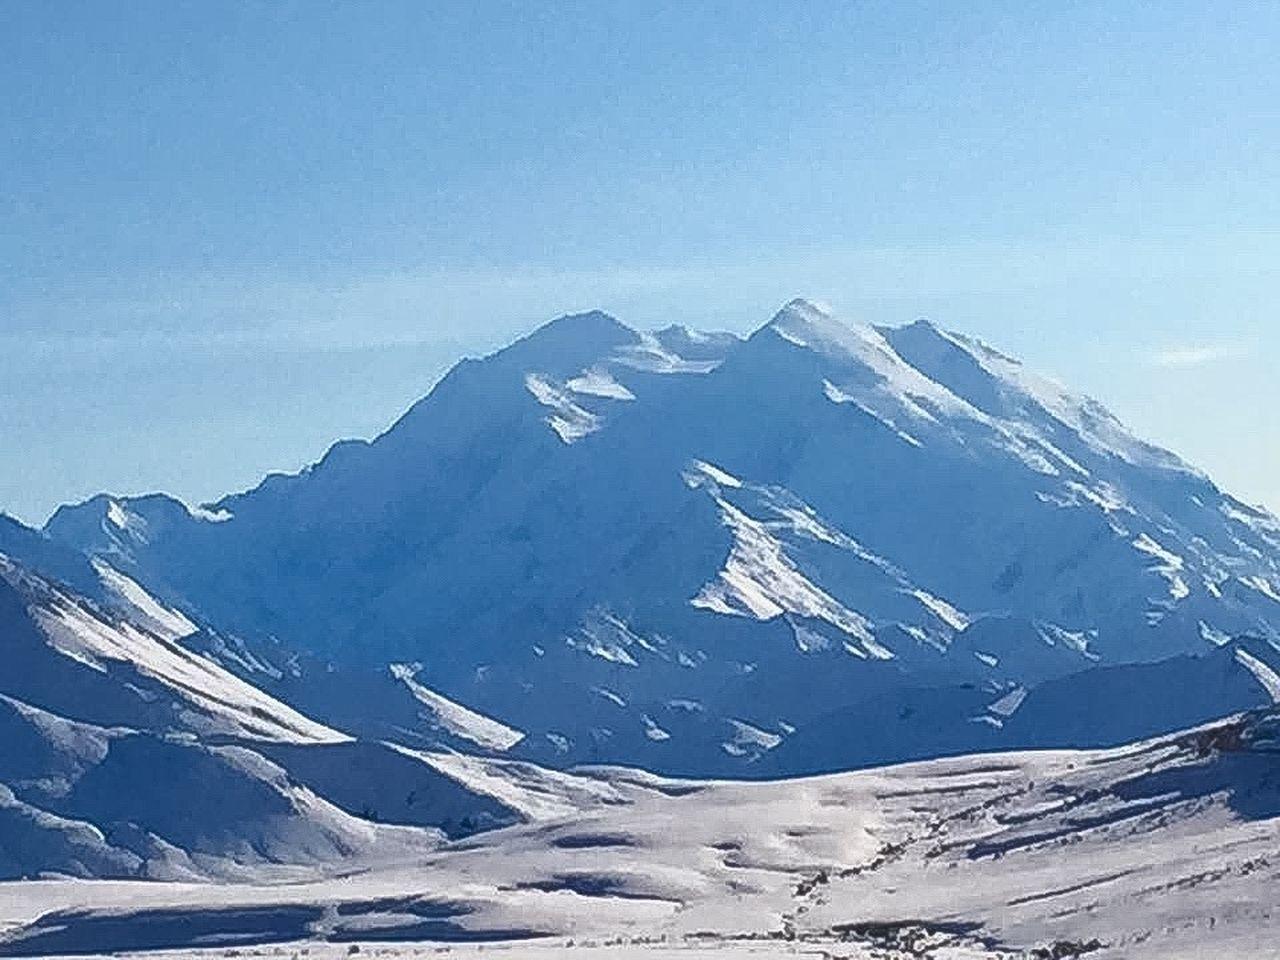 Alaska Mt McKinley Danelie National Park National Geographic Magazine Cover Last Frontier Alaska